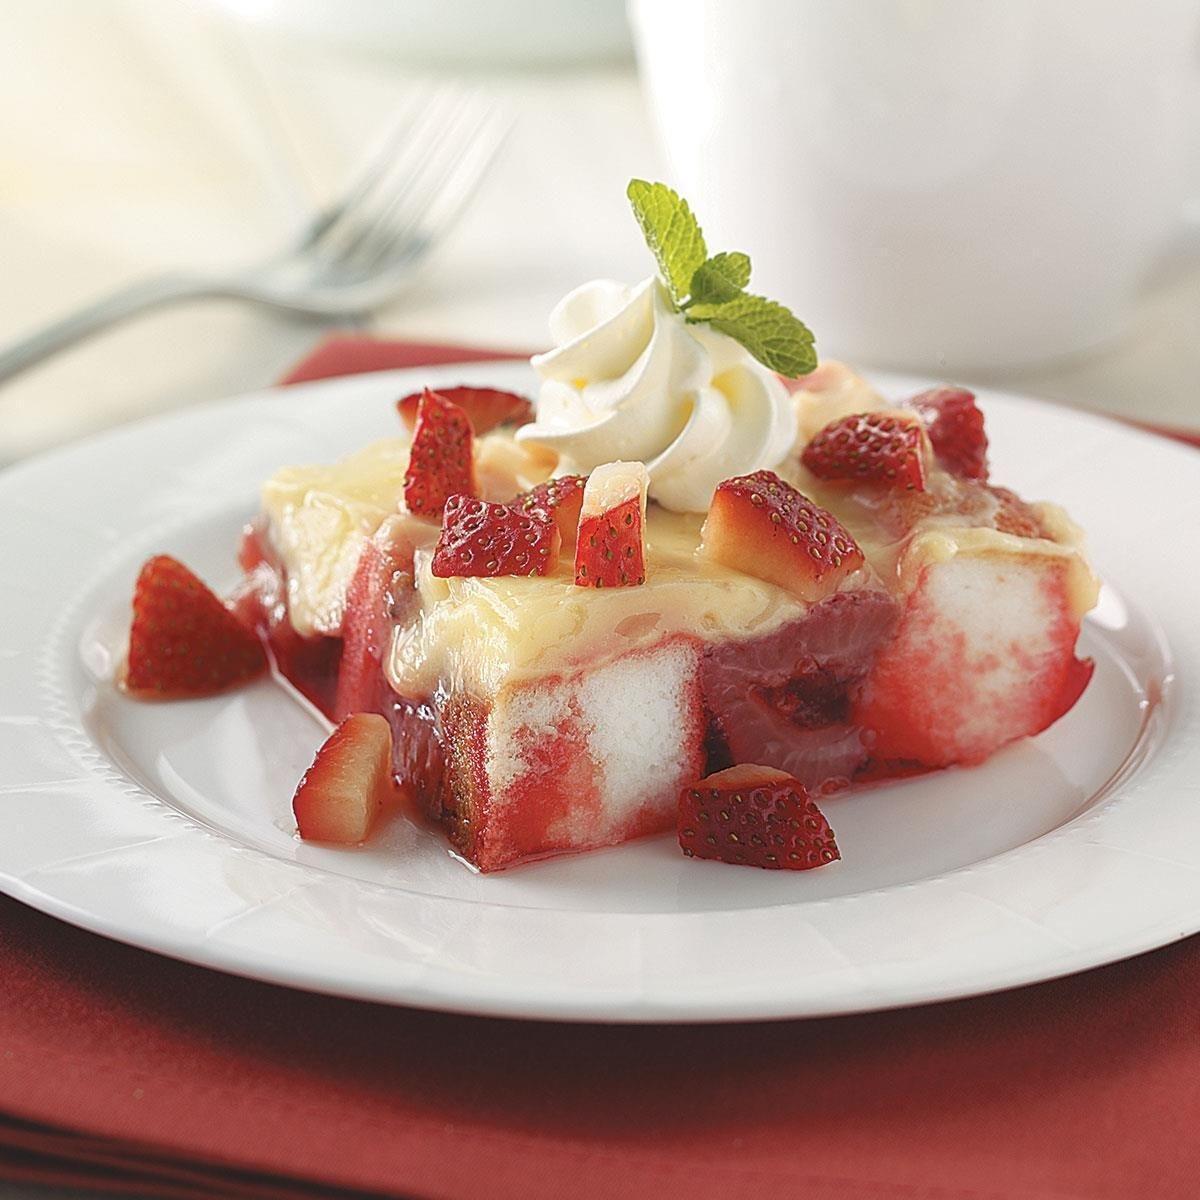 Taste Of Home Diabetic Desserts